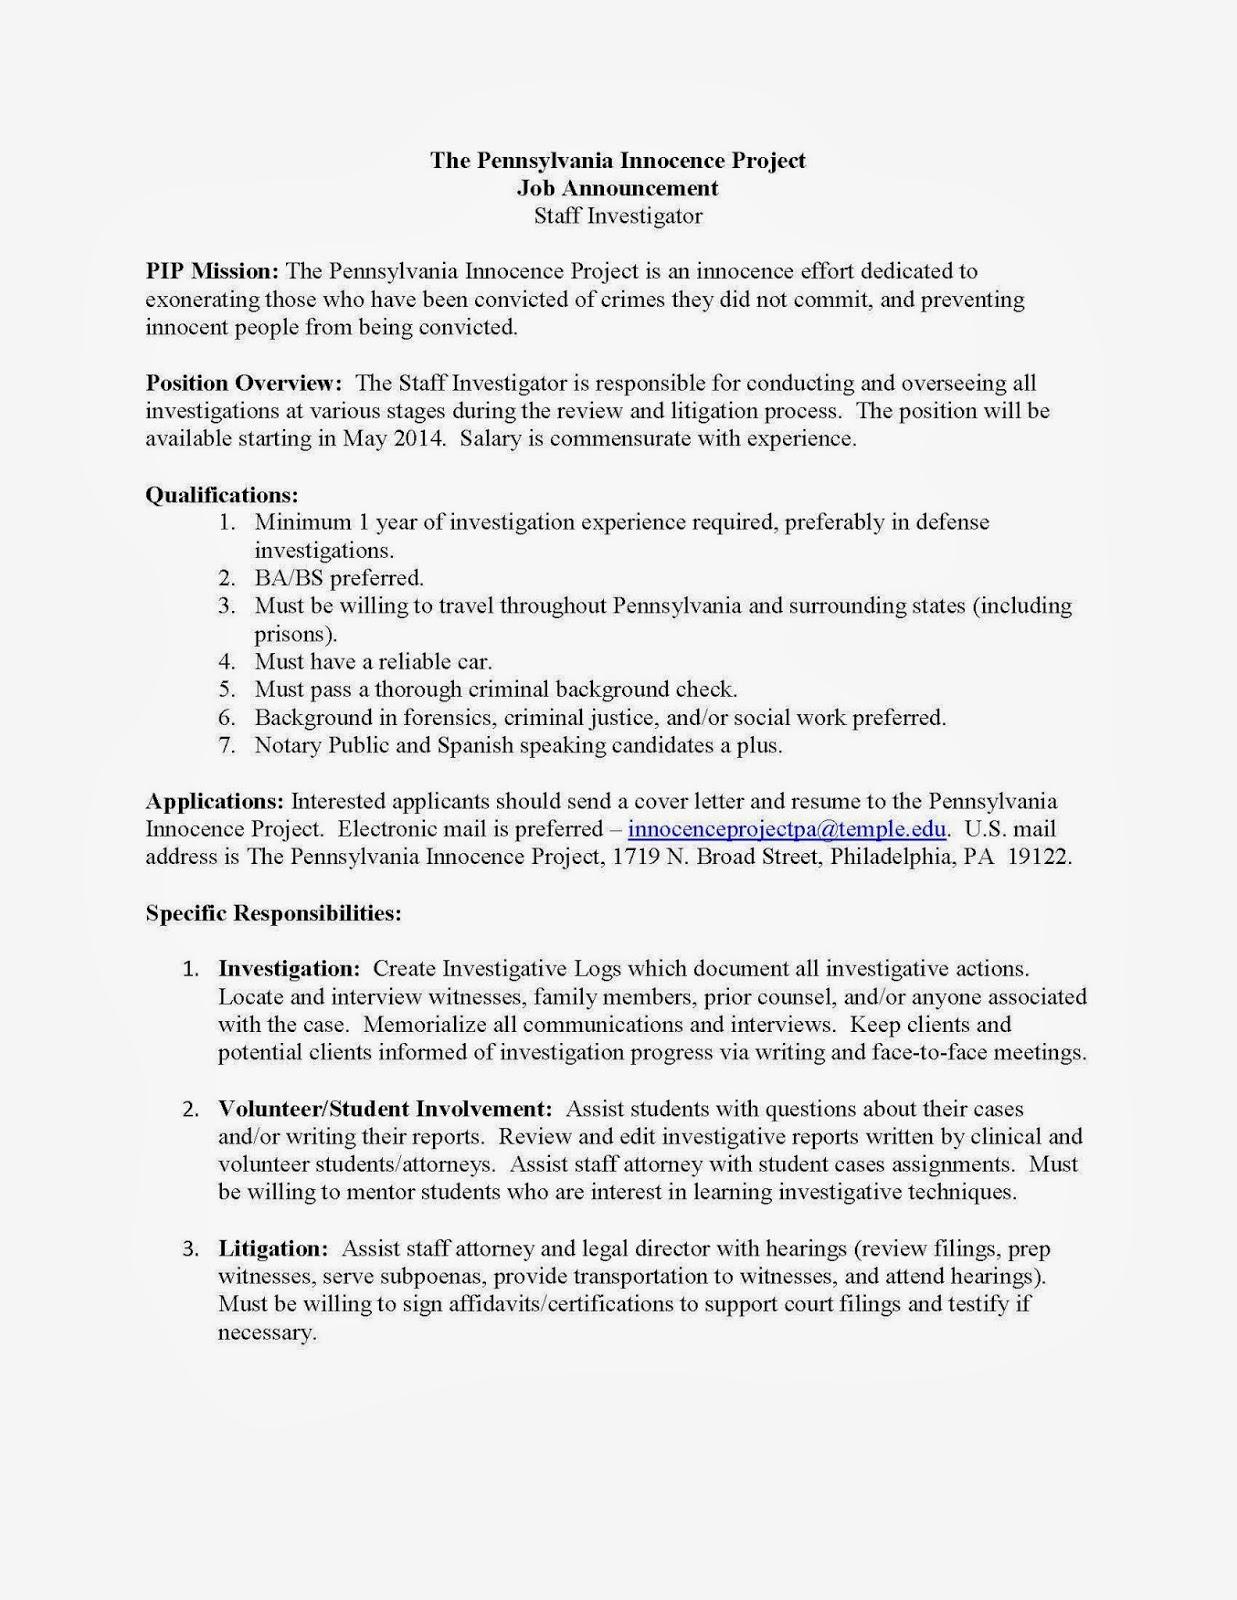 CCJS Undergrad Blog: Pennsylvania Innocence Project- Staff ...